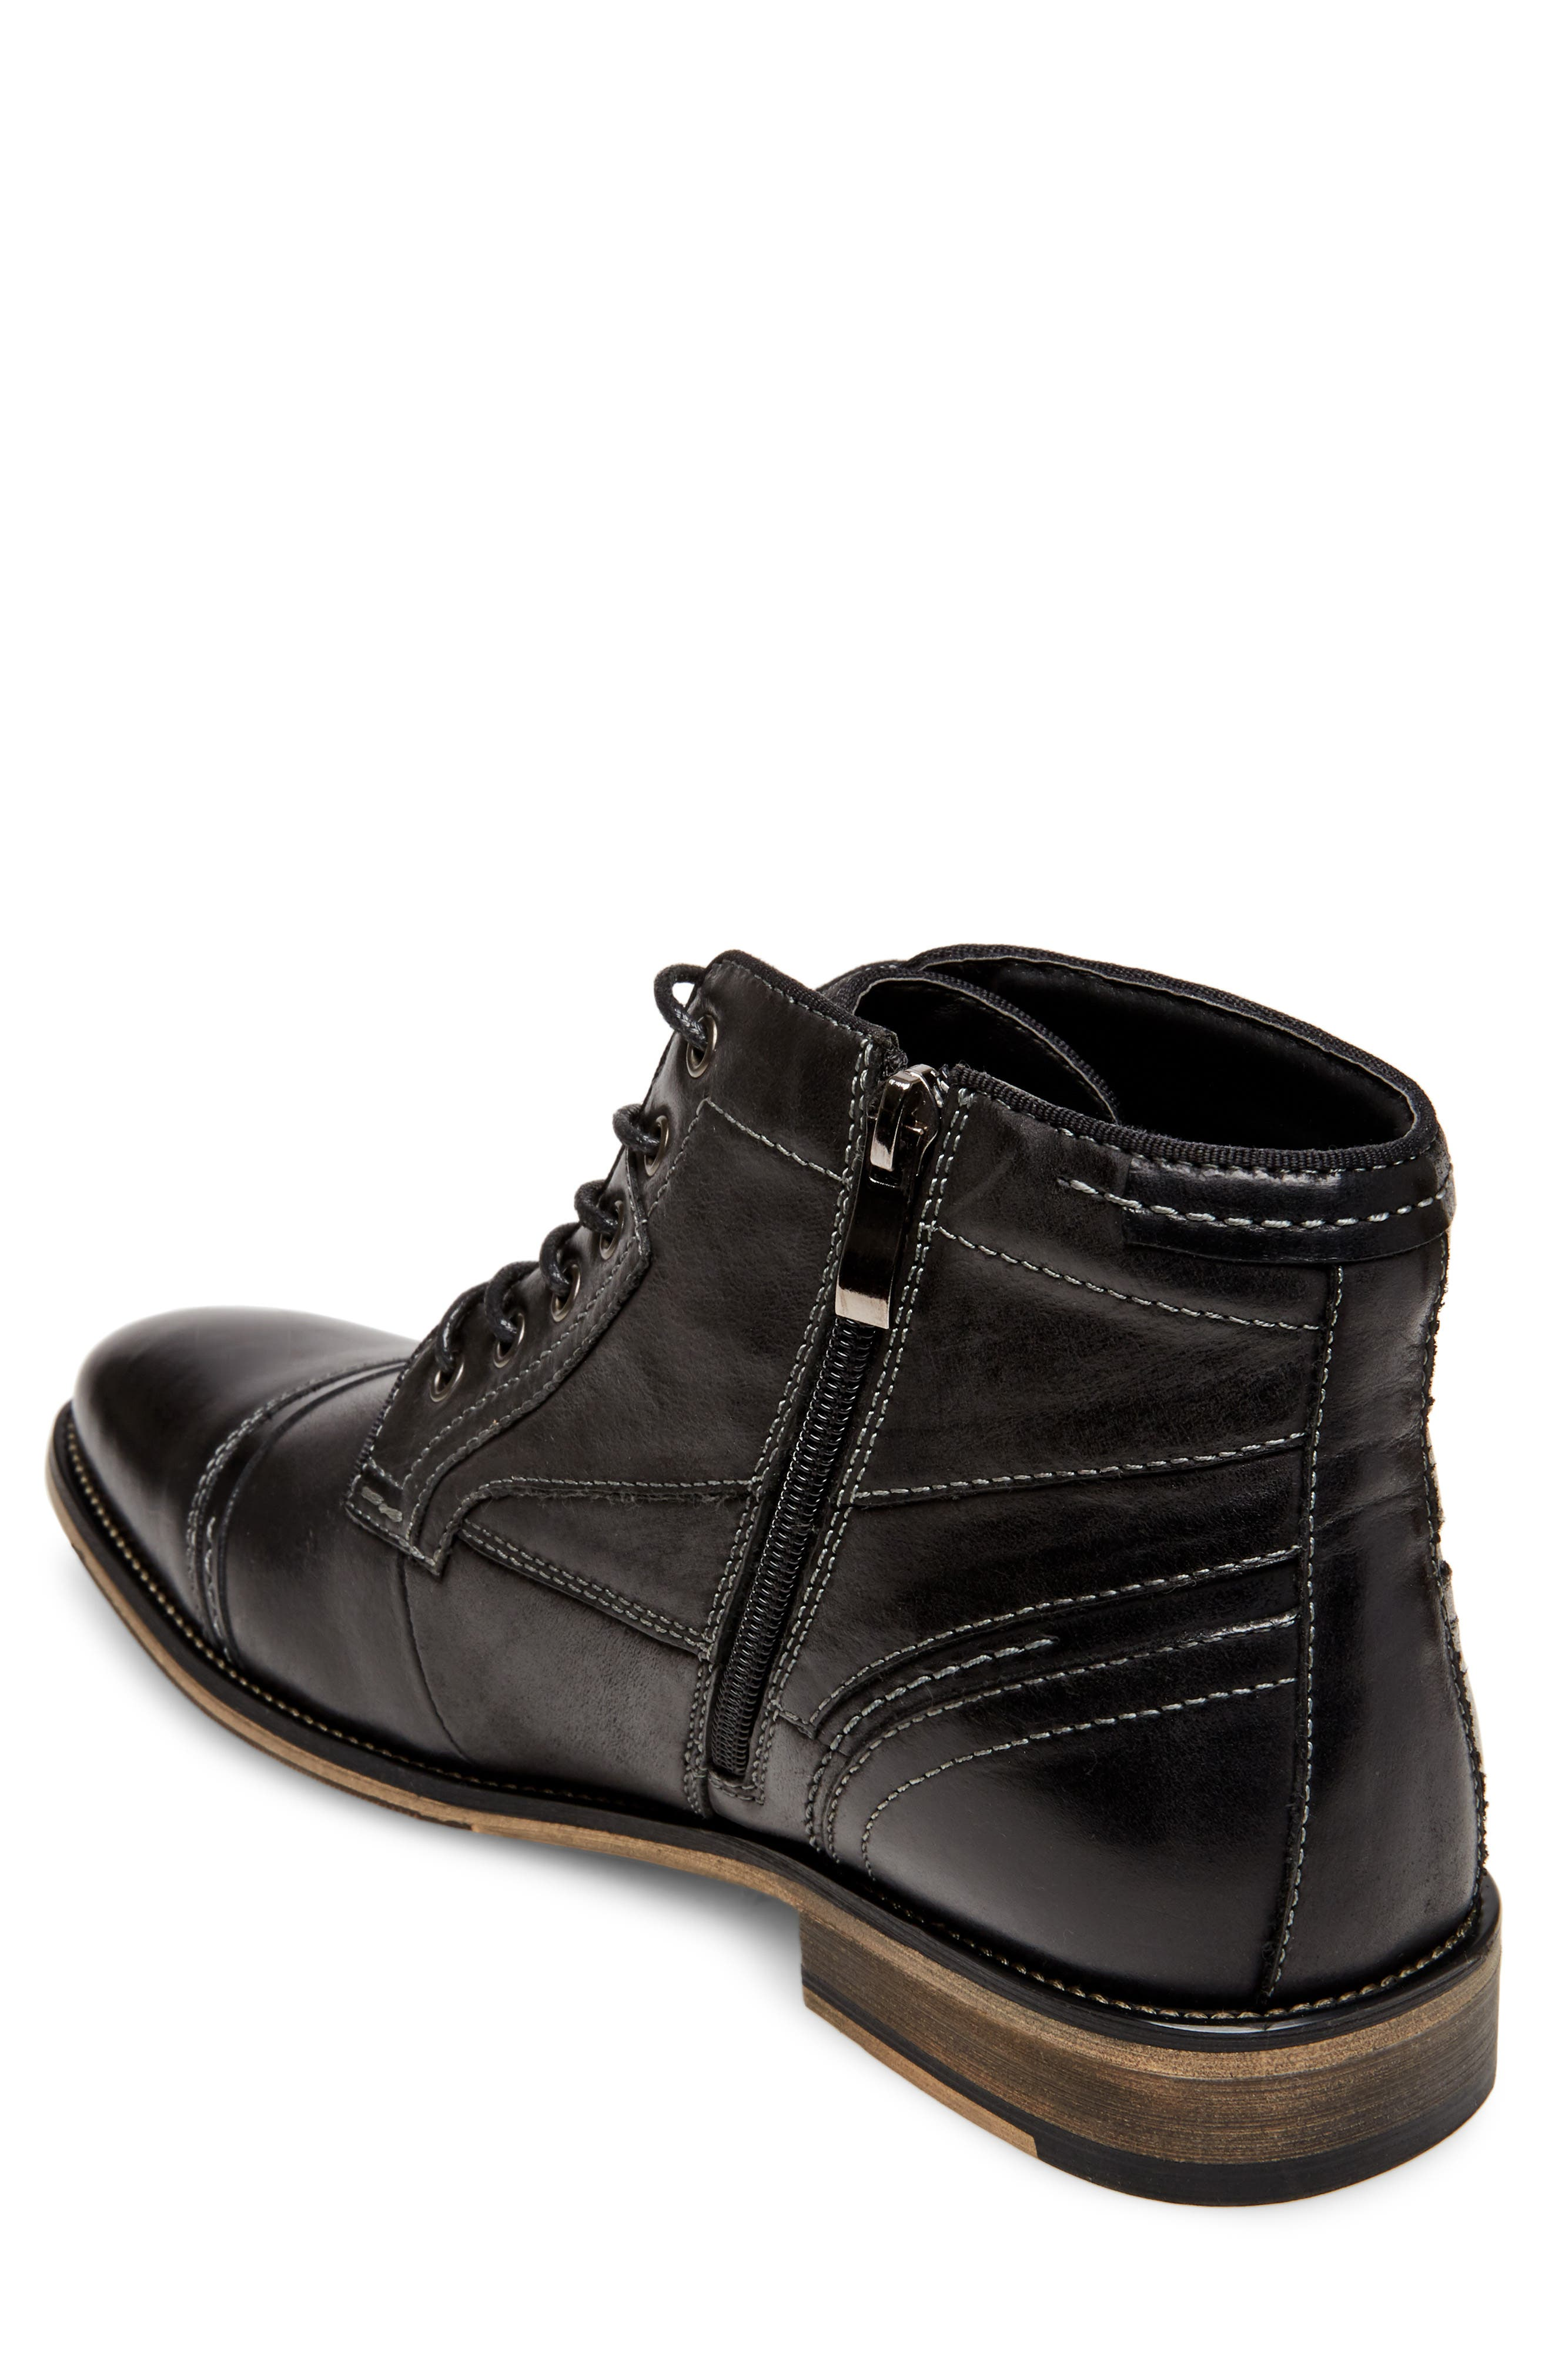 Jeffries Cap Toe Boot,                             Alternate thumbnail 2, color,                             074